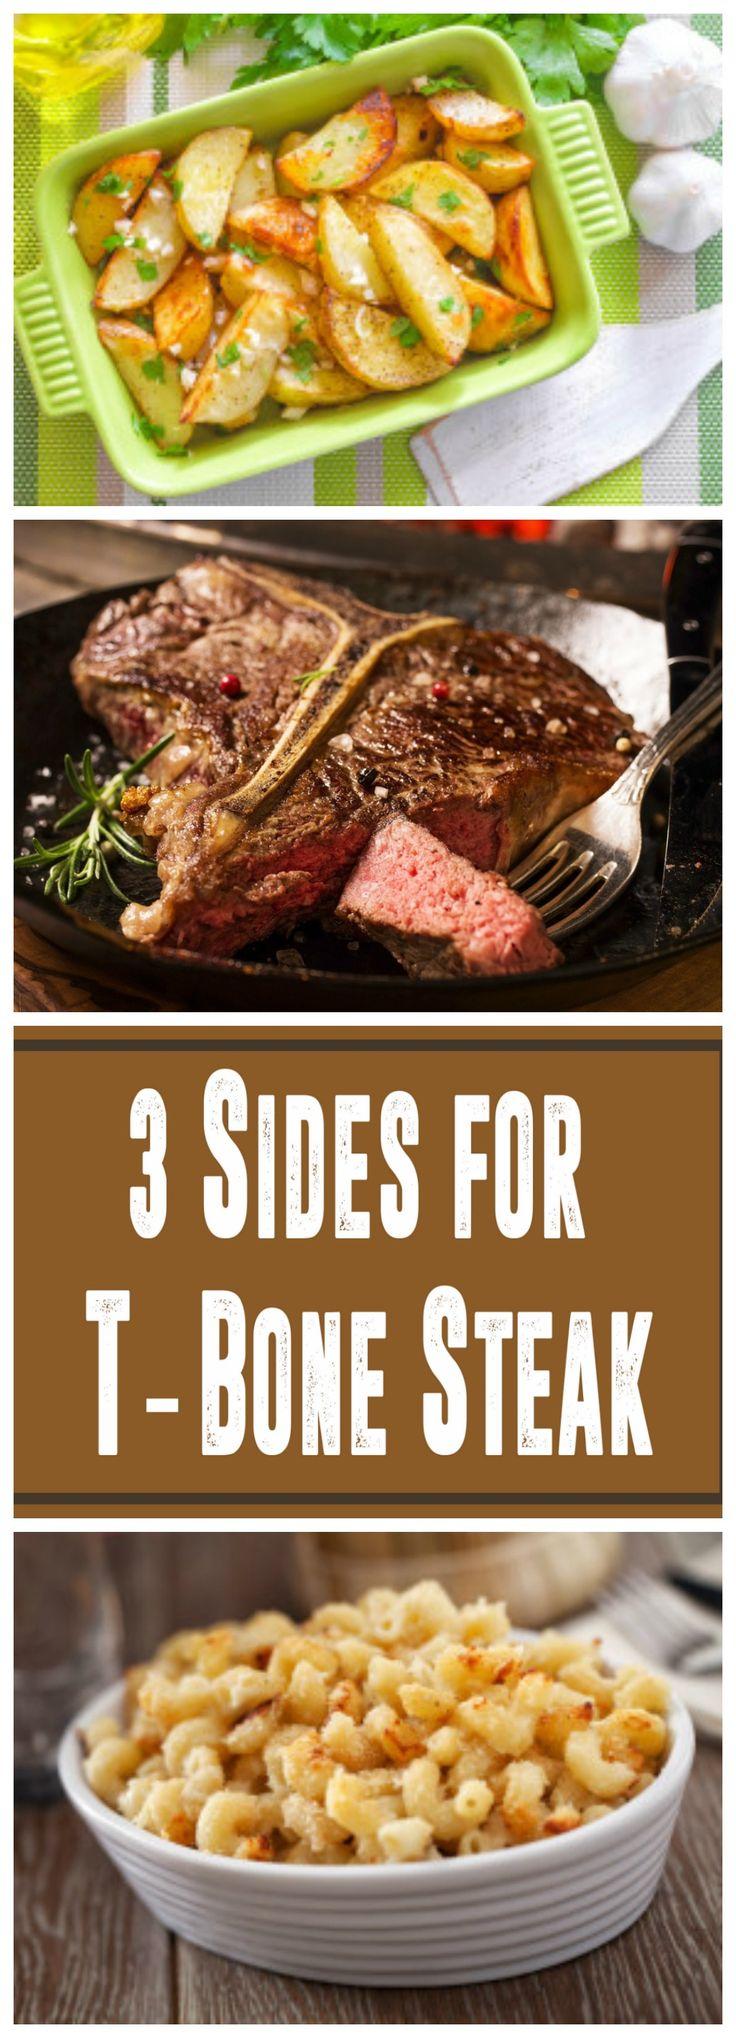 3 Sides for T-Bone Steak